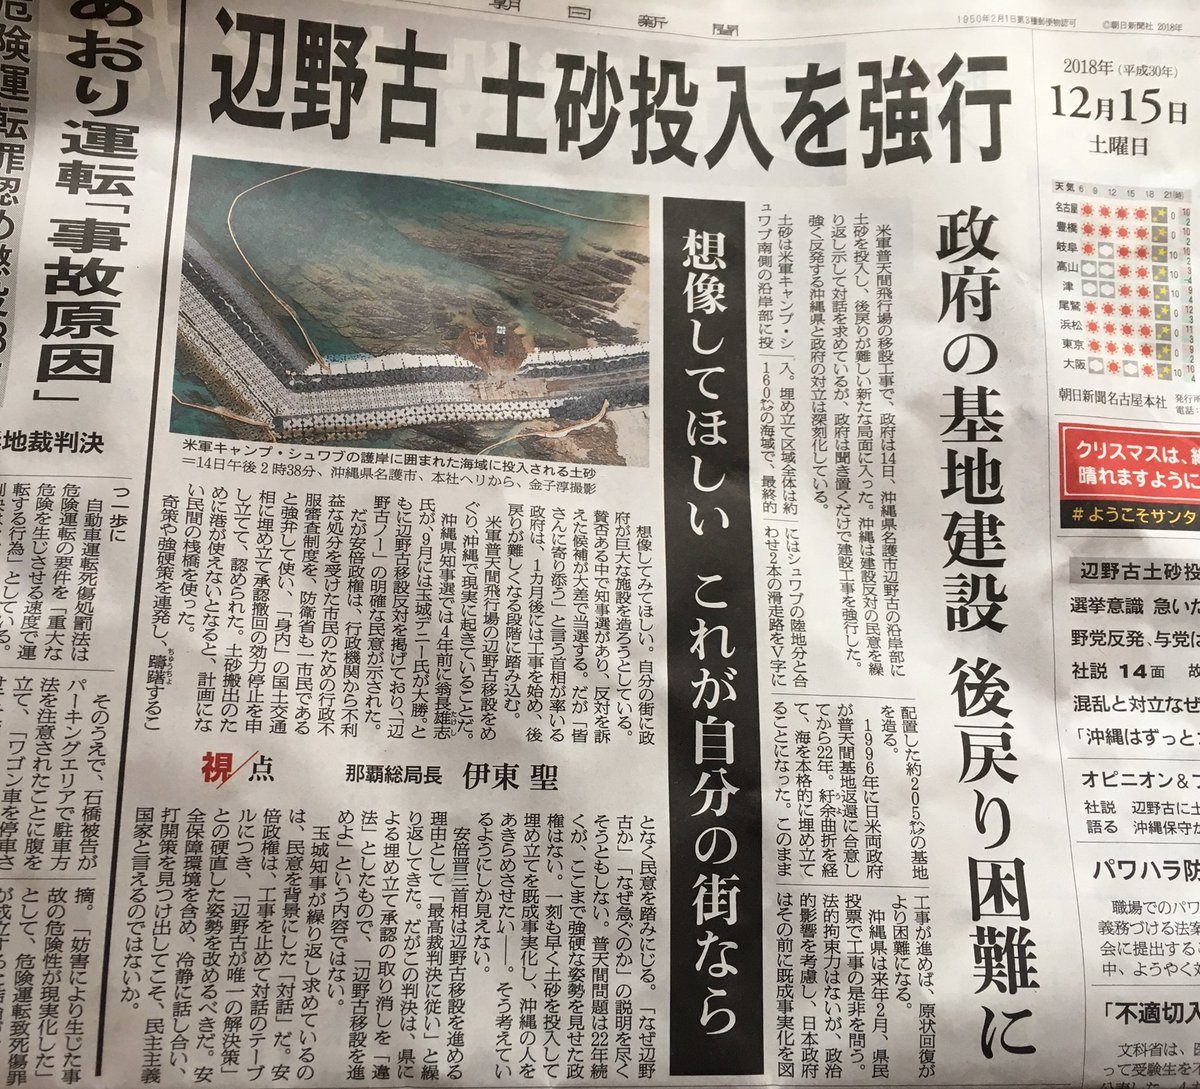 test ツイッターメディア - そして明らかにひどすぎる昨日の辺野古・土砂投入。 辺野古基地NOを掲げて大勝した玉城デニー知事を無視し、明確に示された民意を無視し、民主主義を破壊して強引に押し進め、しかし本土の関心も薄い。 近藤昭一さんは沖縄等米軍基地問題議員懇談会の会長でもあり、この蛮行についても当然語られてた。 https://t.co/inSGD3MyOQ